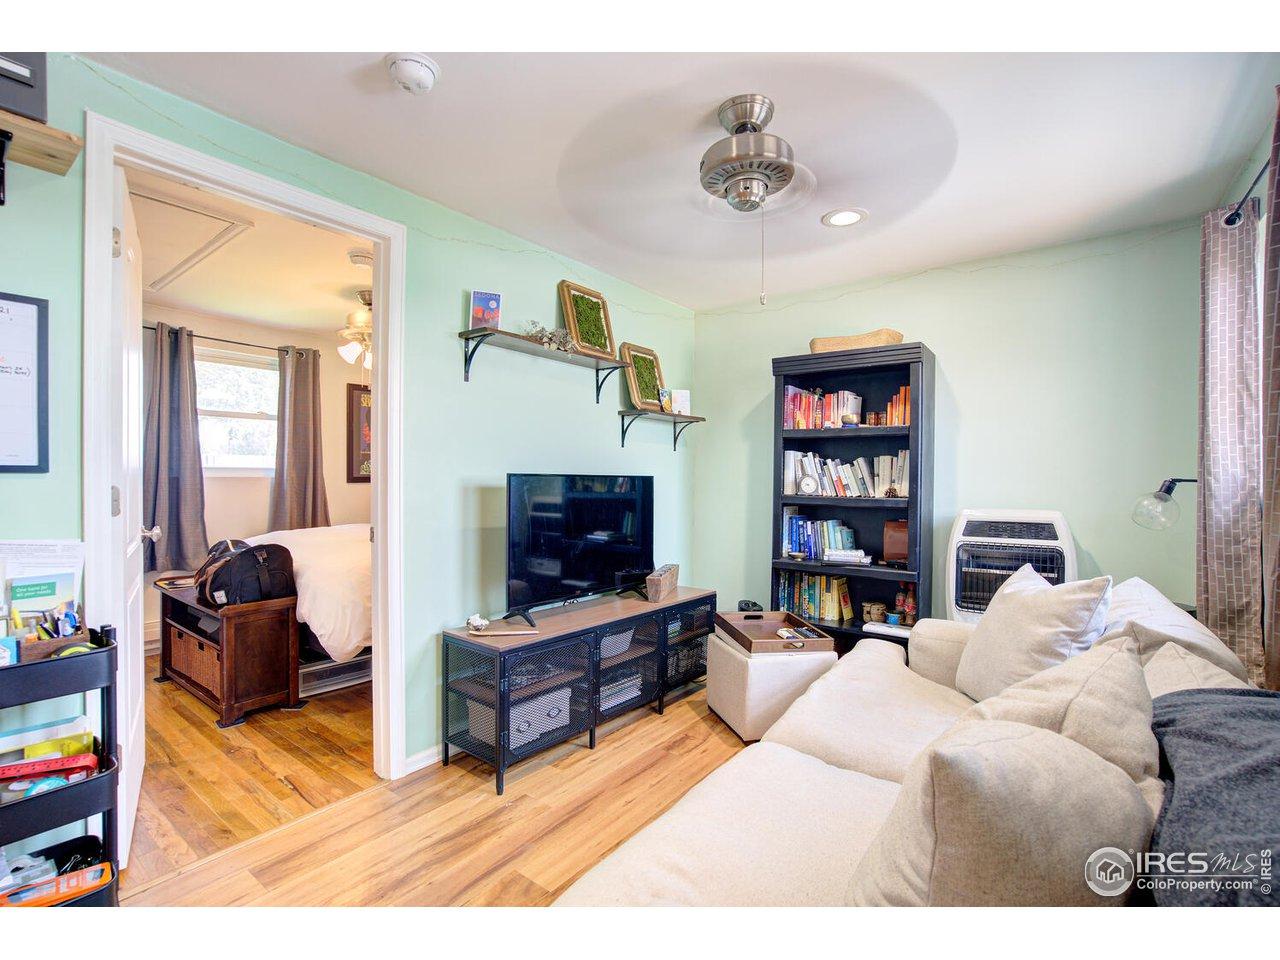 10 x 8 Living Room